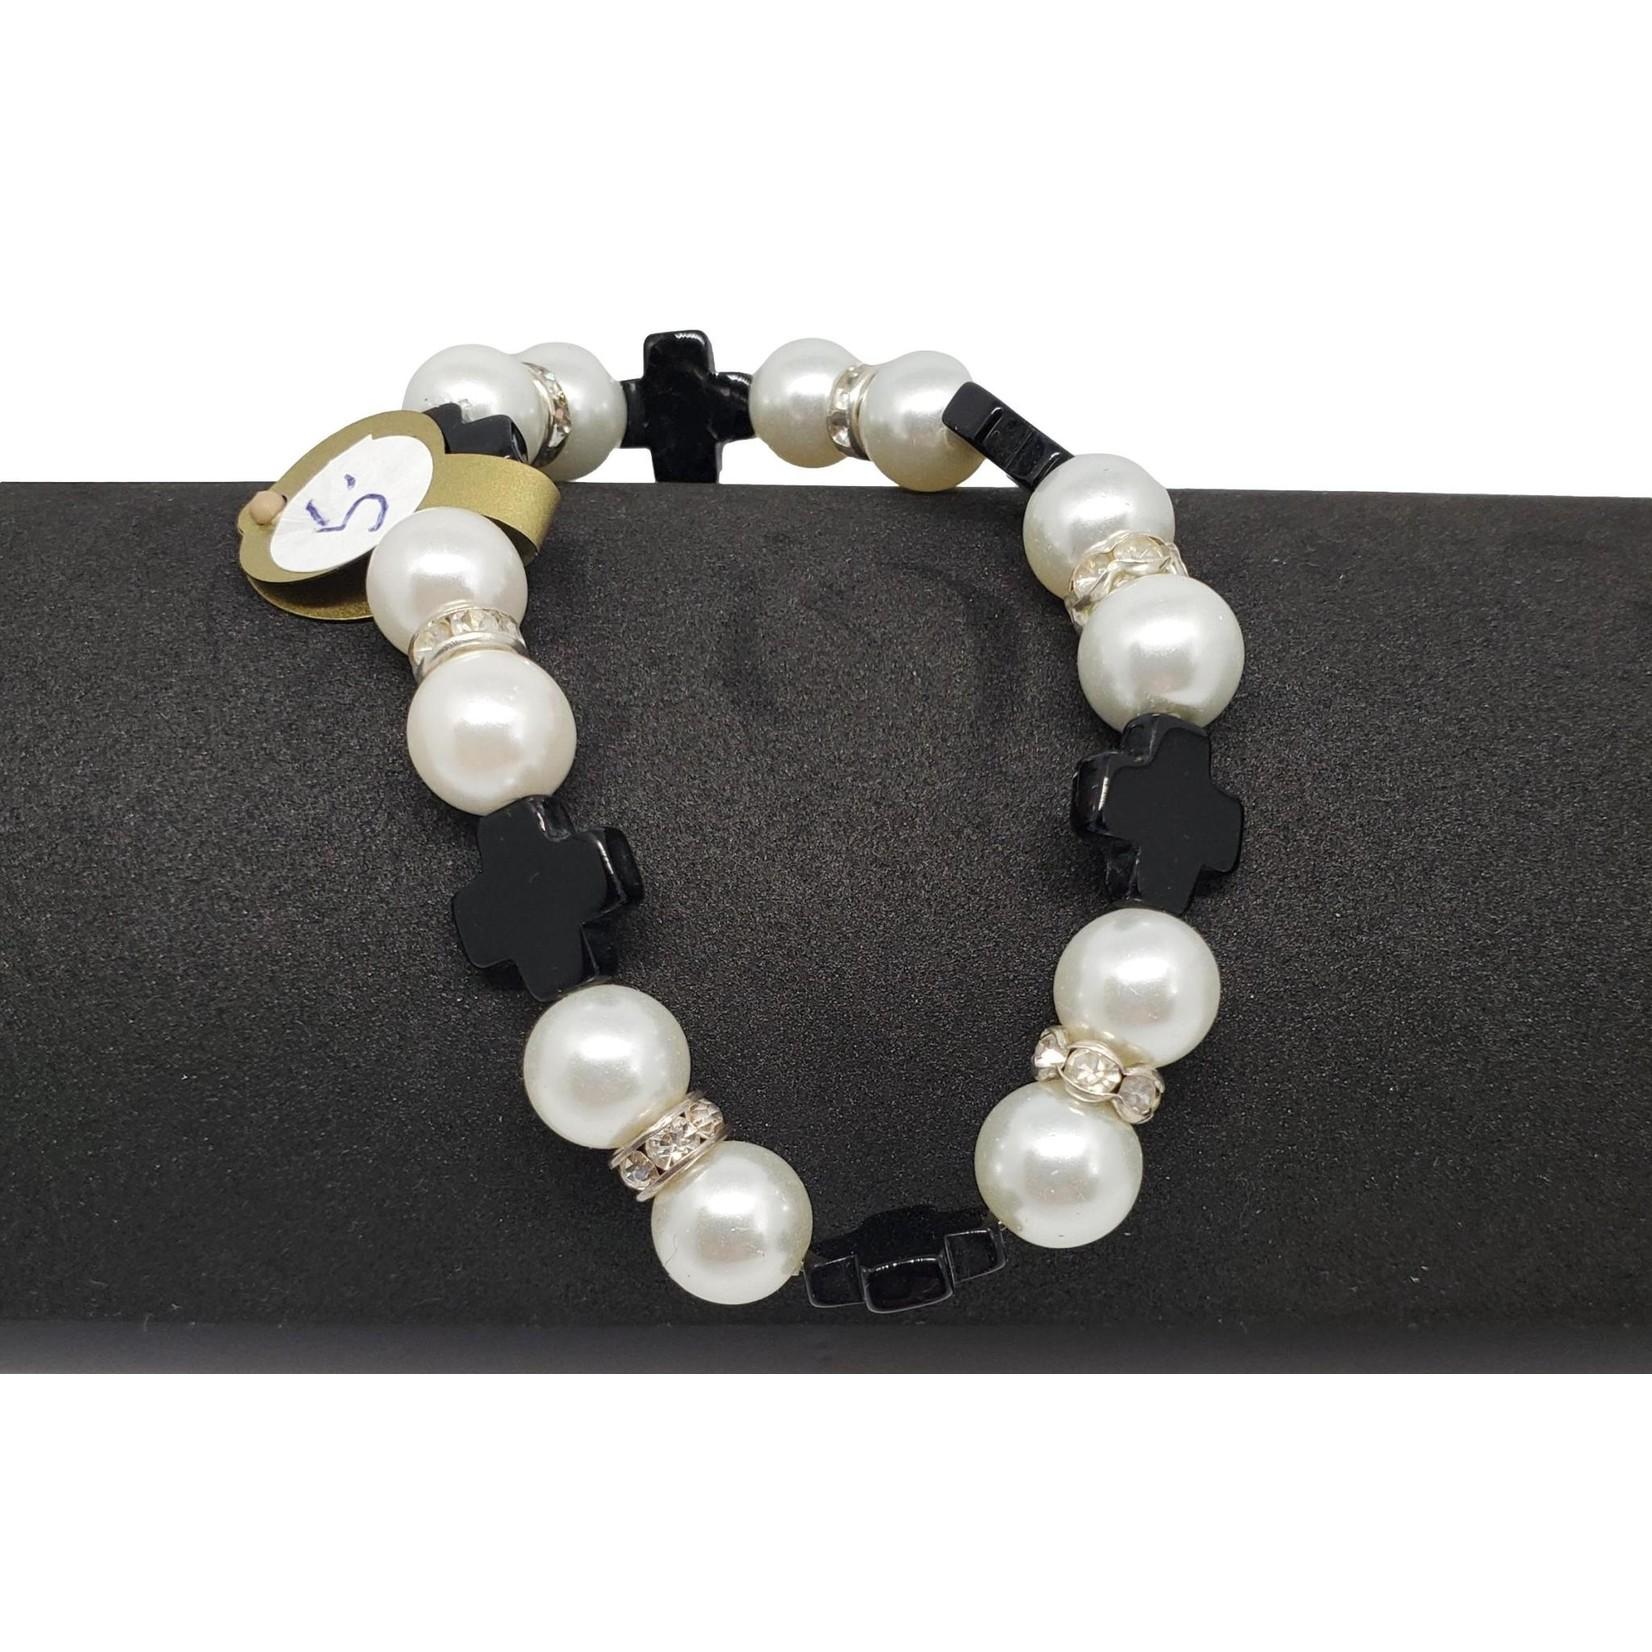 Jewellery by Deborah Young-Groves White Pearl & Black Cross Beaded Bracelet